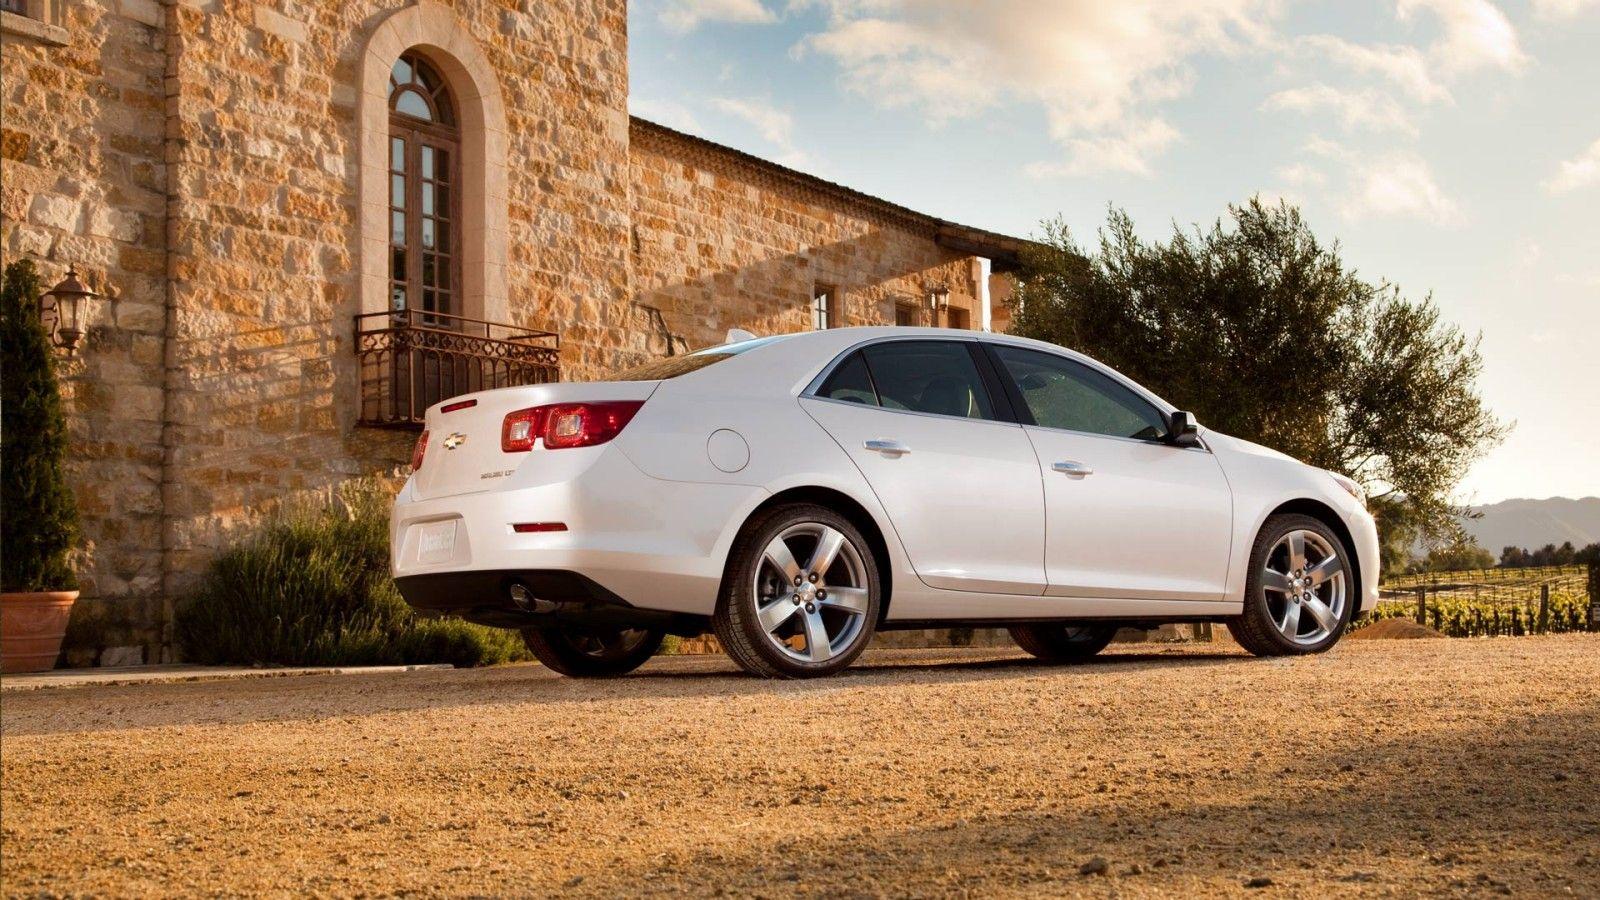 Profile View Of A White Diamond Malibu Ltz Mid Size Sedan Malibustyle Chevrolet Mid Size Sedan Mid Size Car